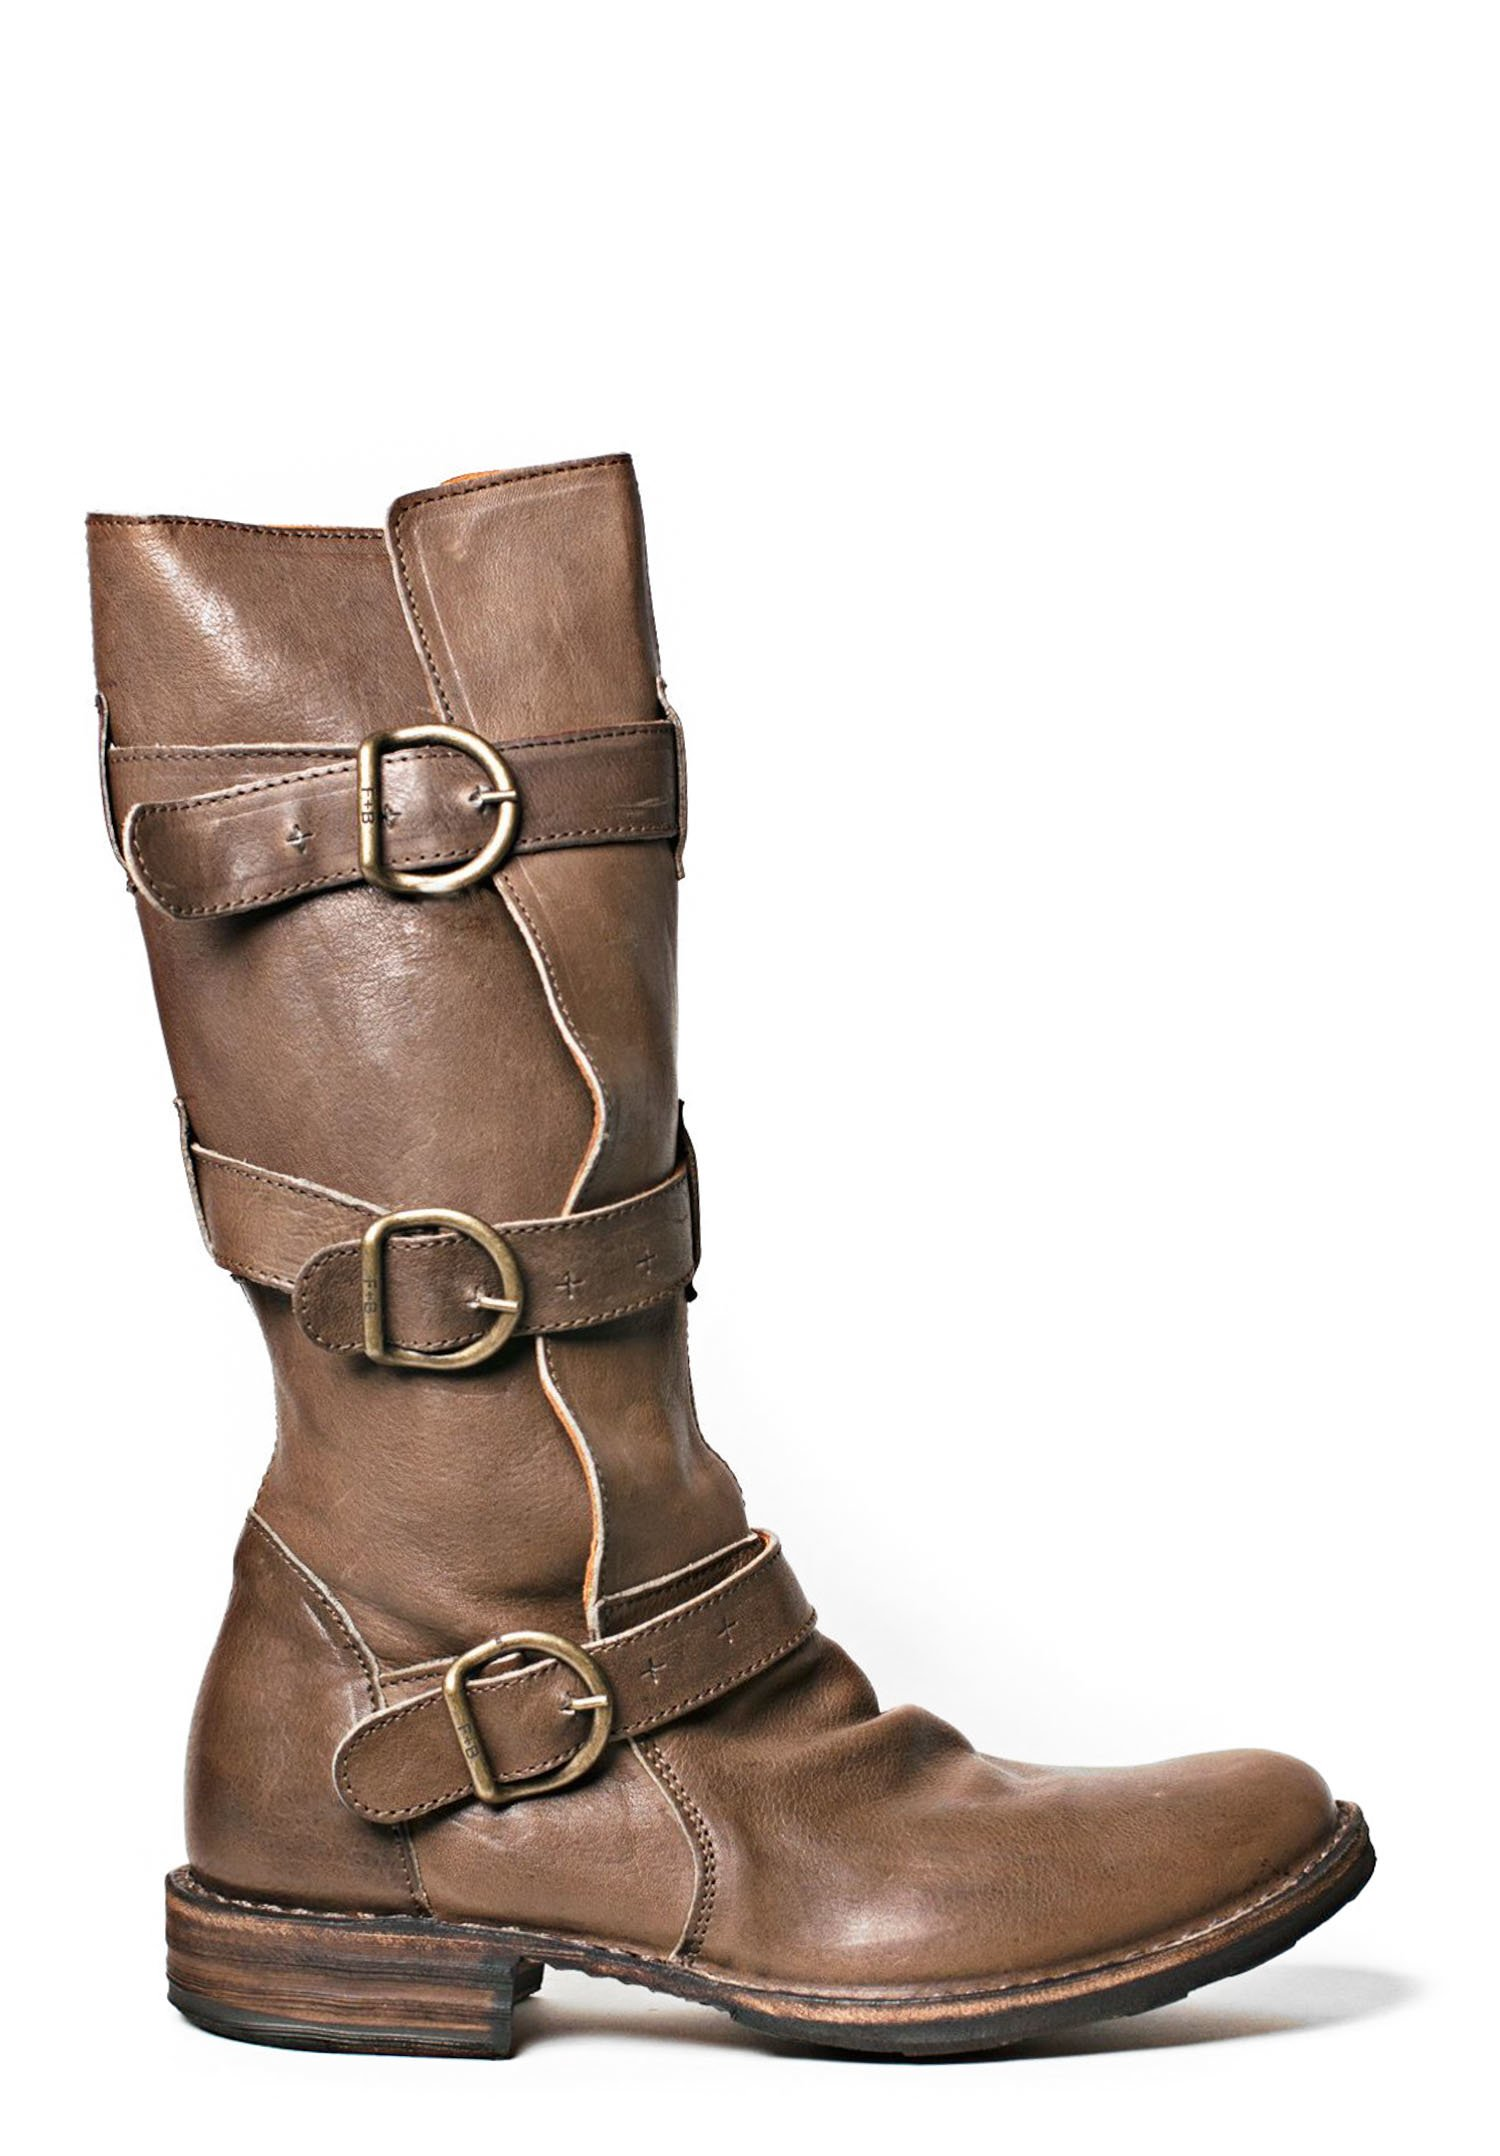 fiorentini and baker eternity boot in cusna santa fe dry. Black Bedroom Furniture Sets. Home Design Ideas